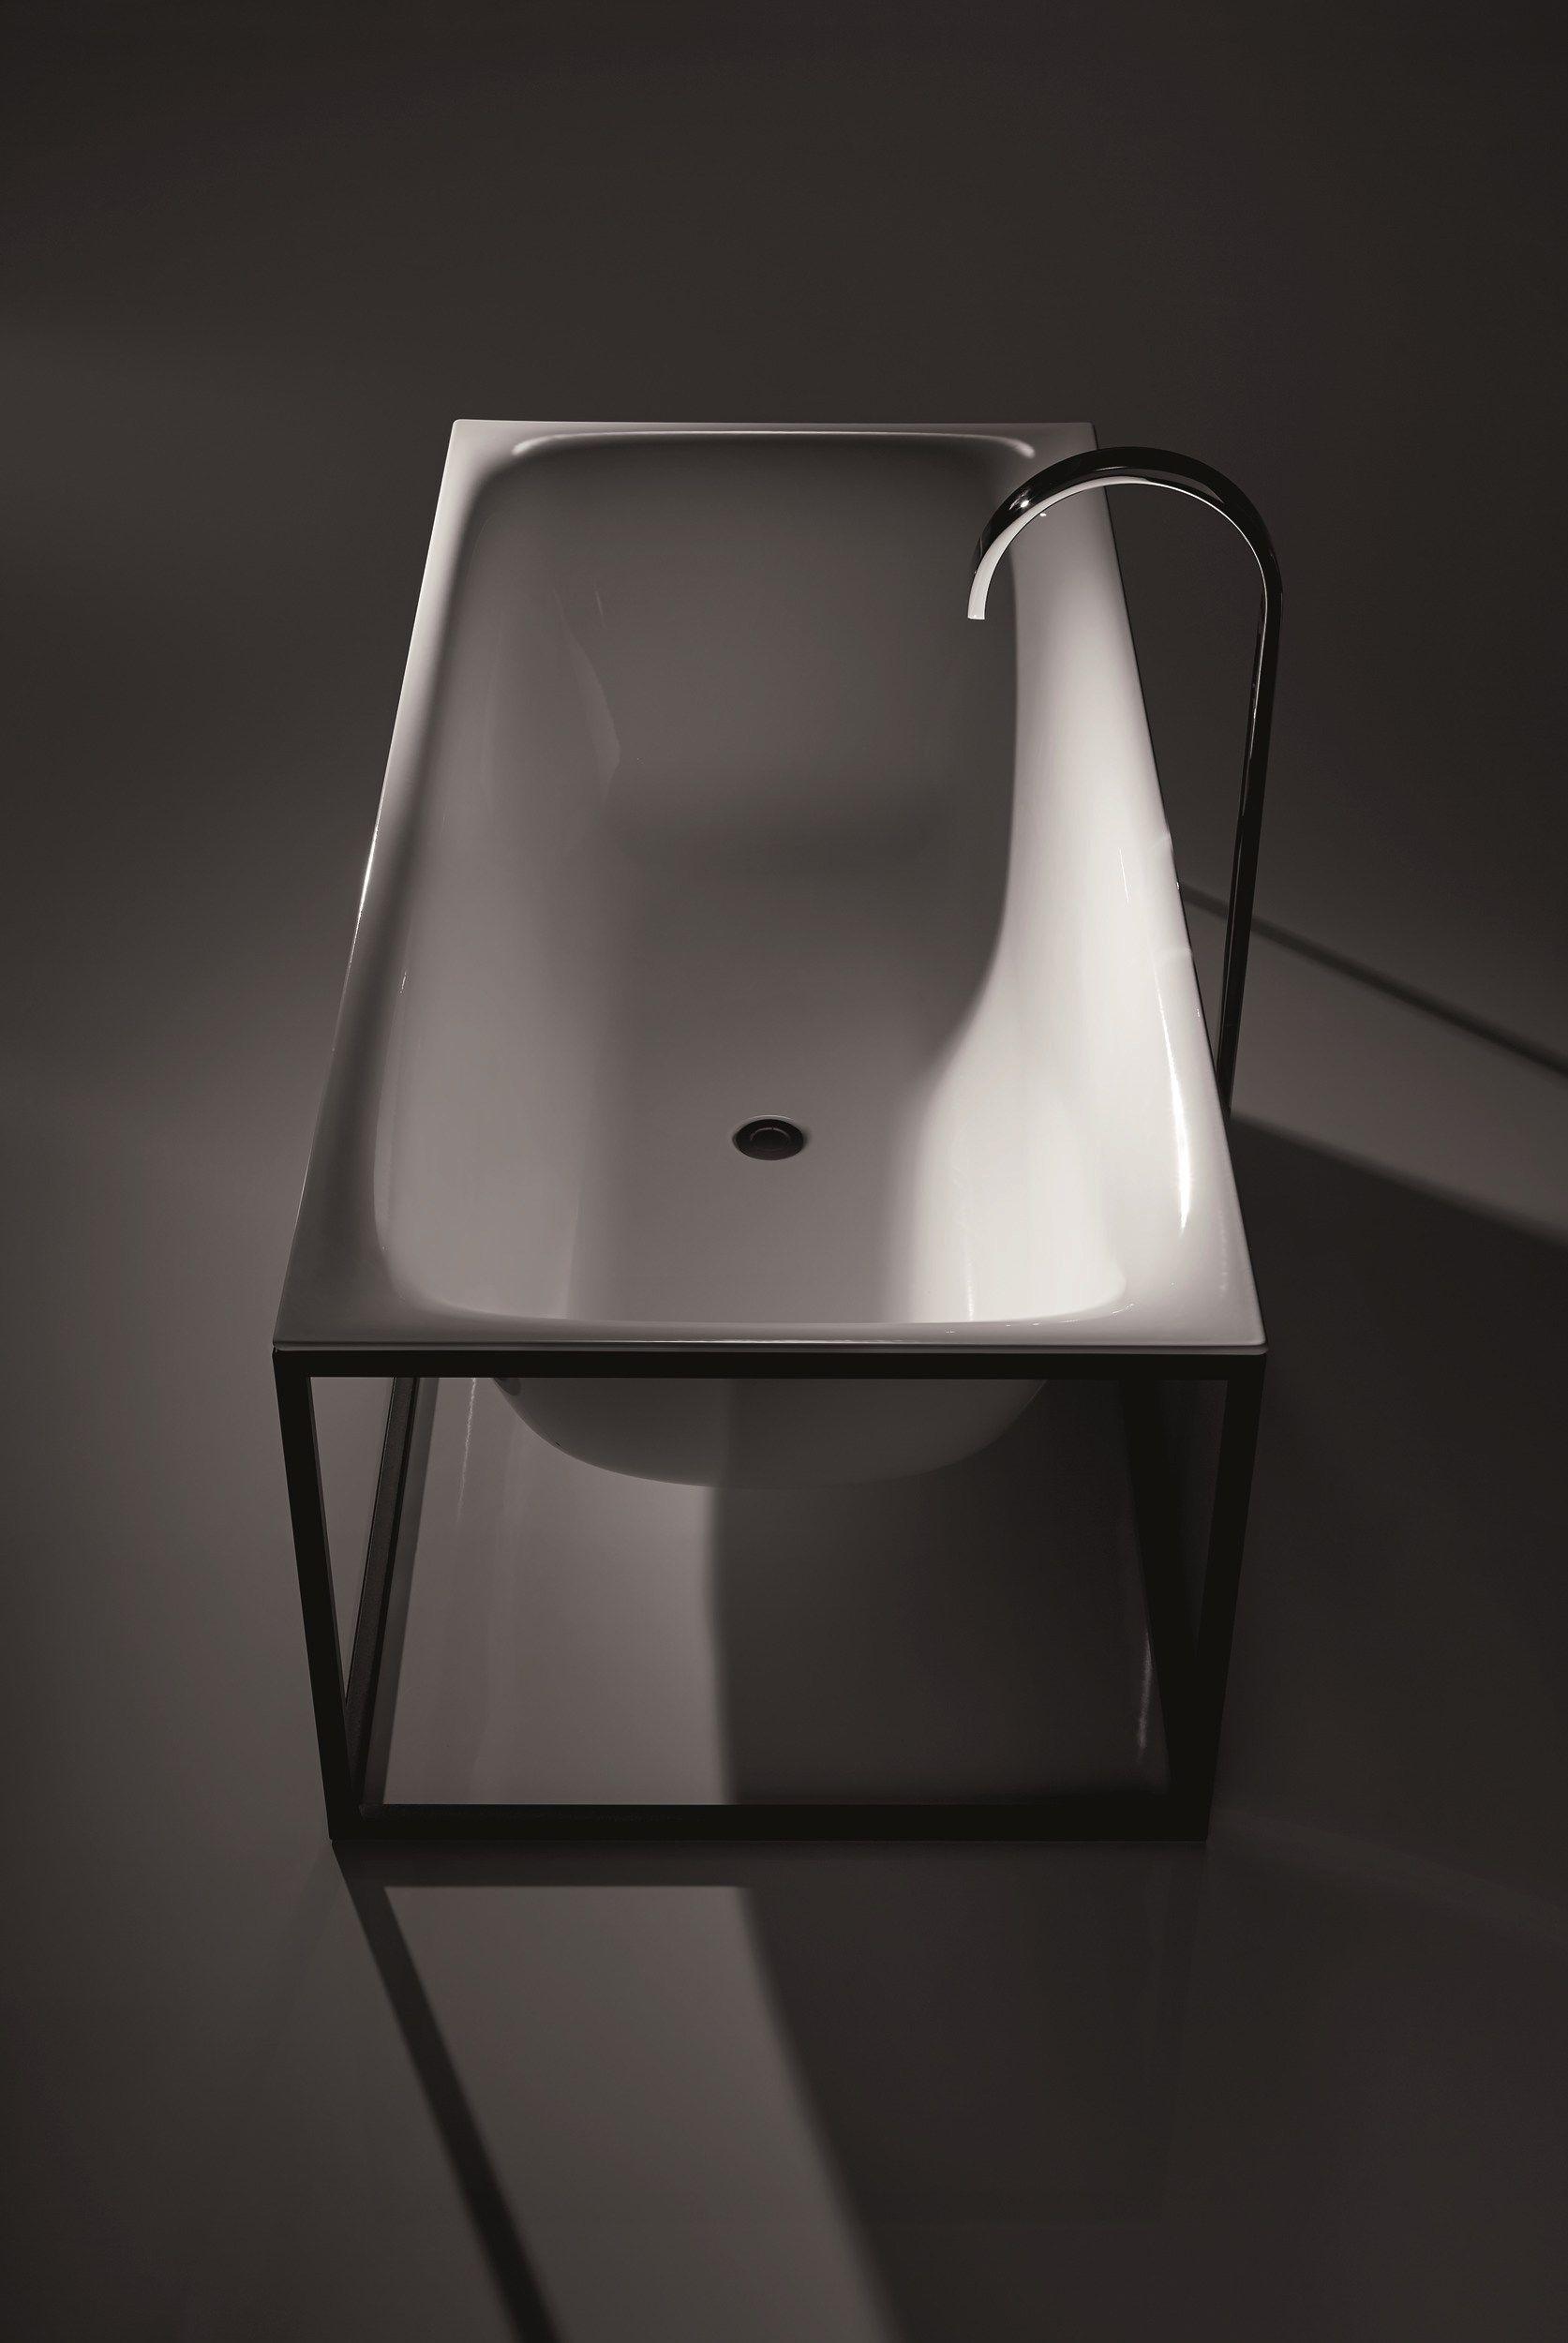 bettelux shape baignoire by bette design tesseraux partner. Black Bedroom Furniture Sets. Home Design Ideas